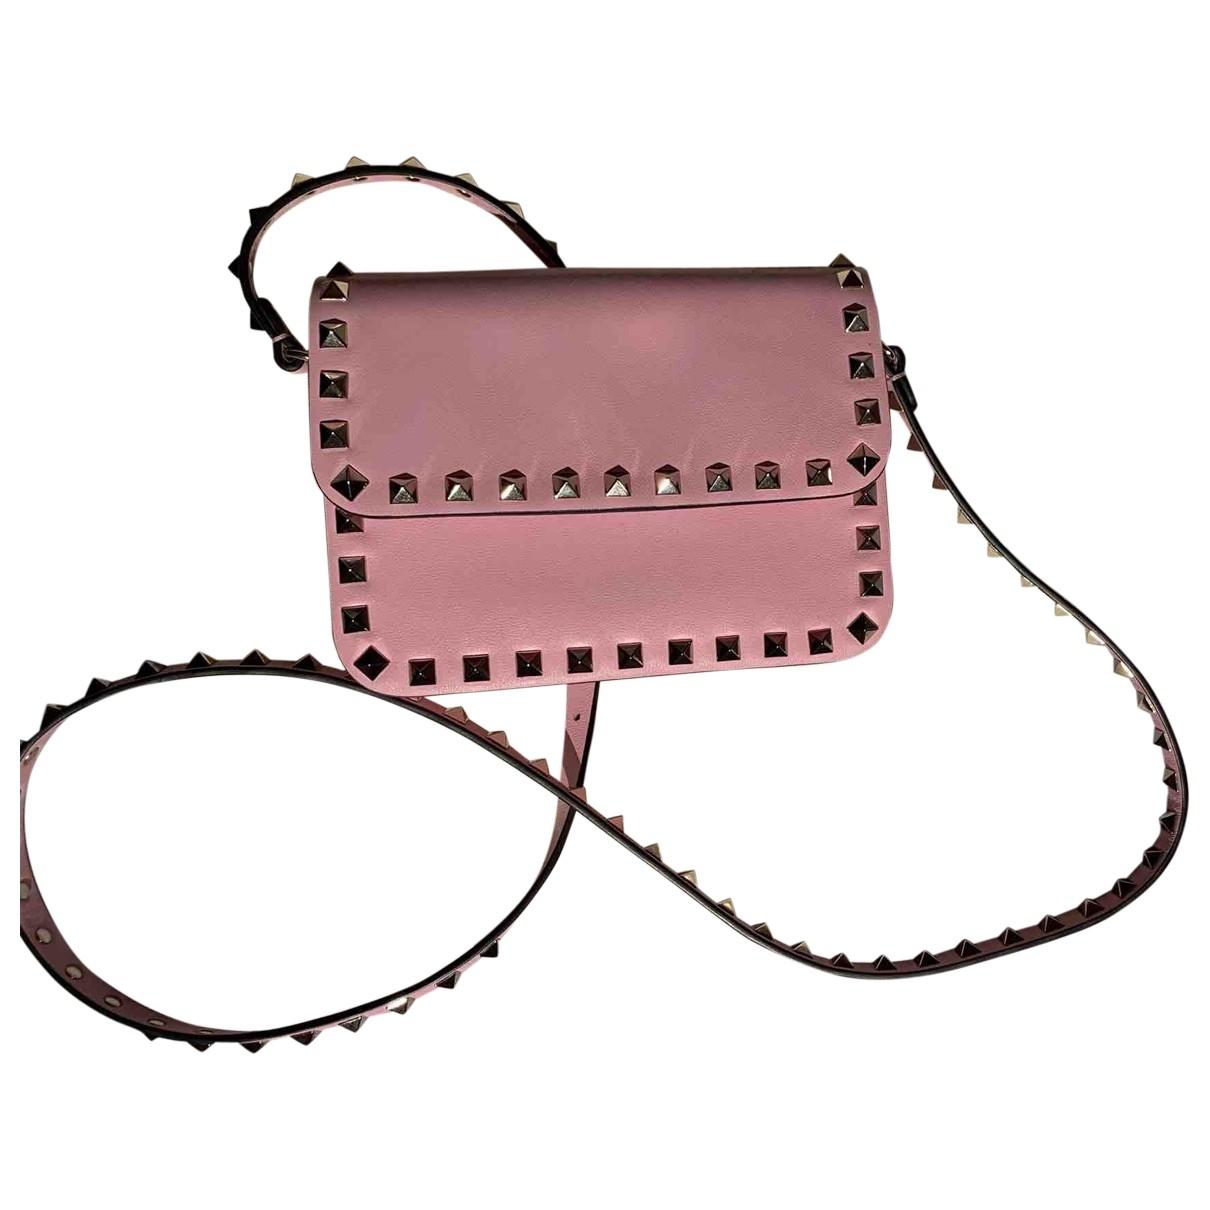 Valentino Garavani - Sac a main Rockstud spike pour femme en cuir - rose